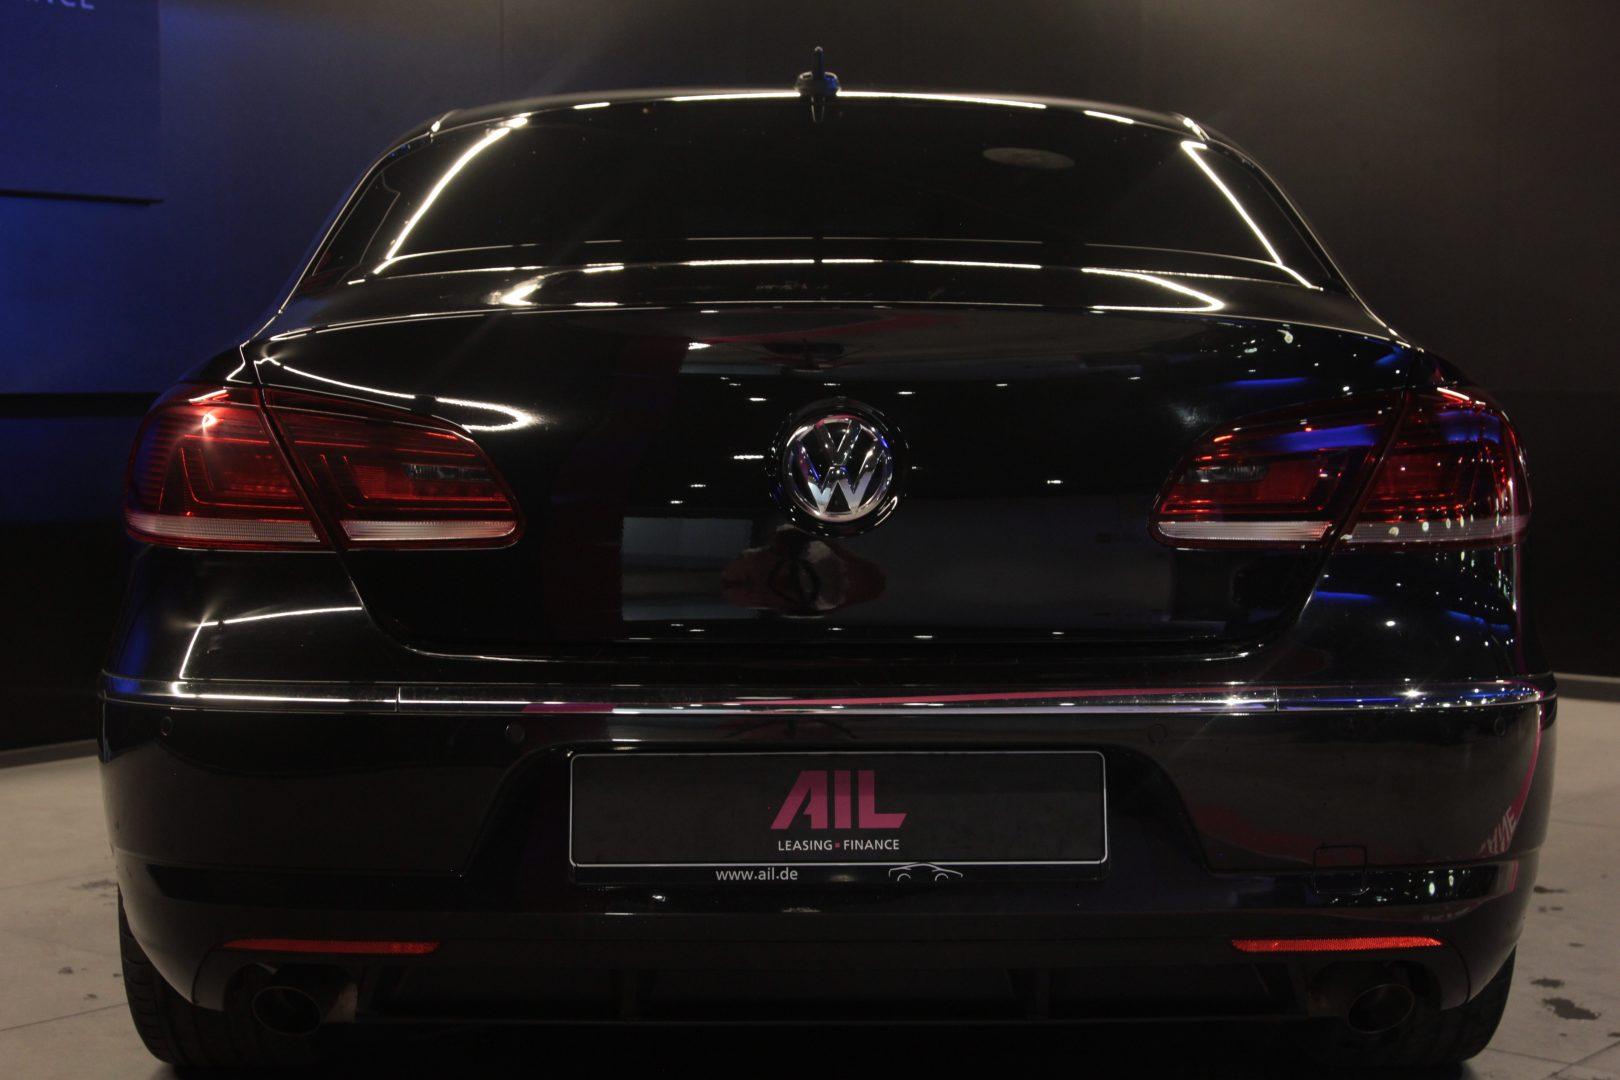 AIL VW CC 2.0TDI Basis BMT 4Motion DSG 7